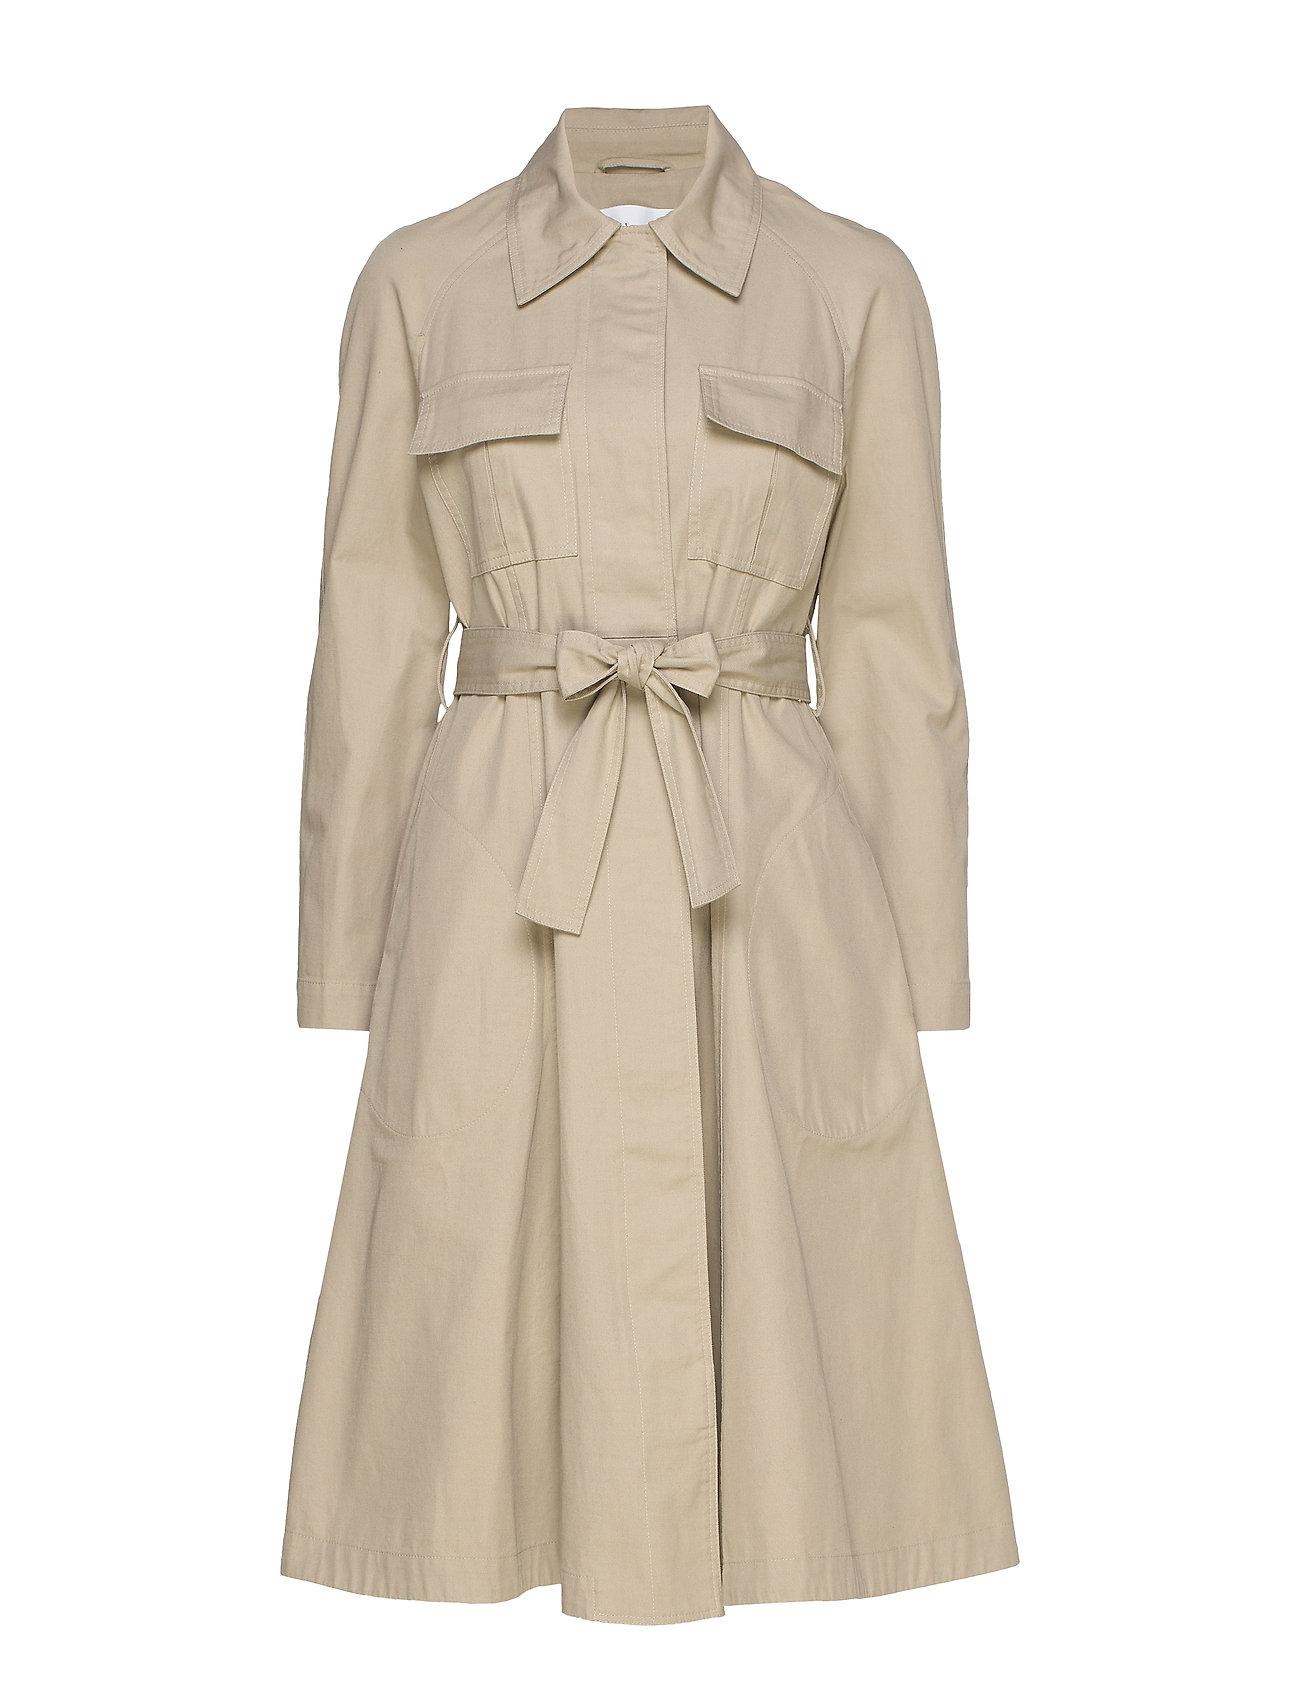 Lovechild 1979 Alessia Dress - SAND